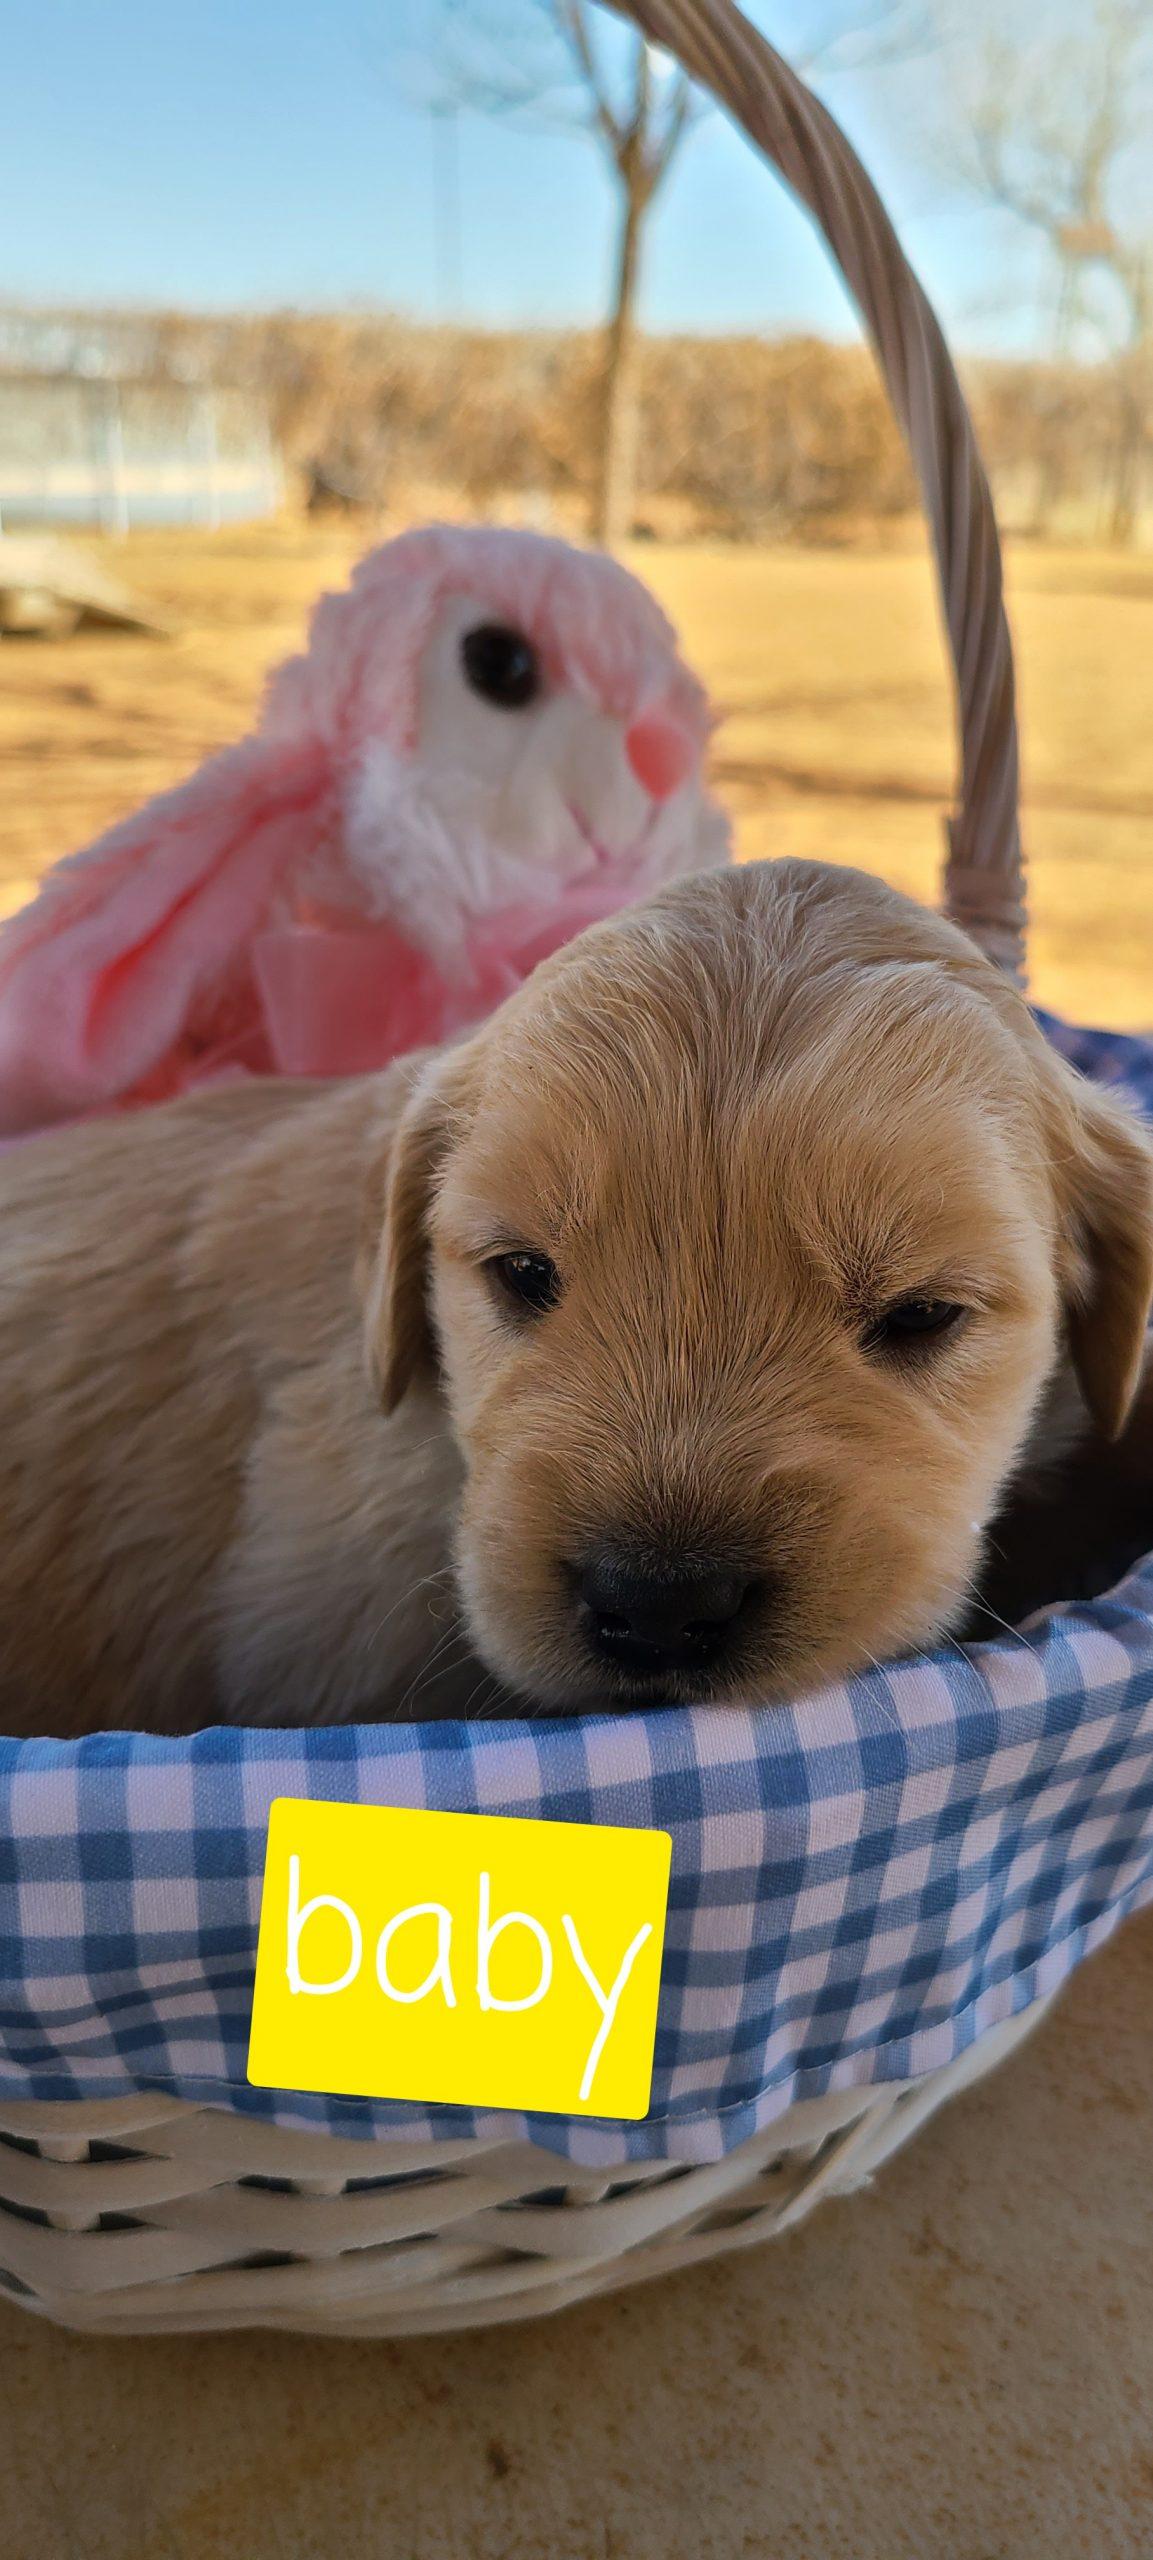 Baby - puppie ACA Golden Retriever female for sale in Eunice, New Mexico